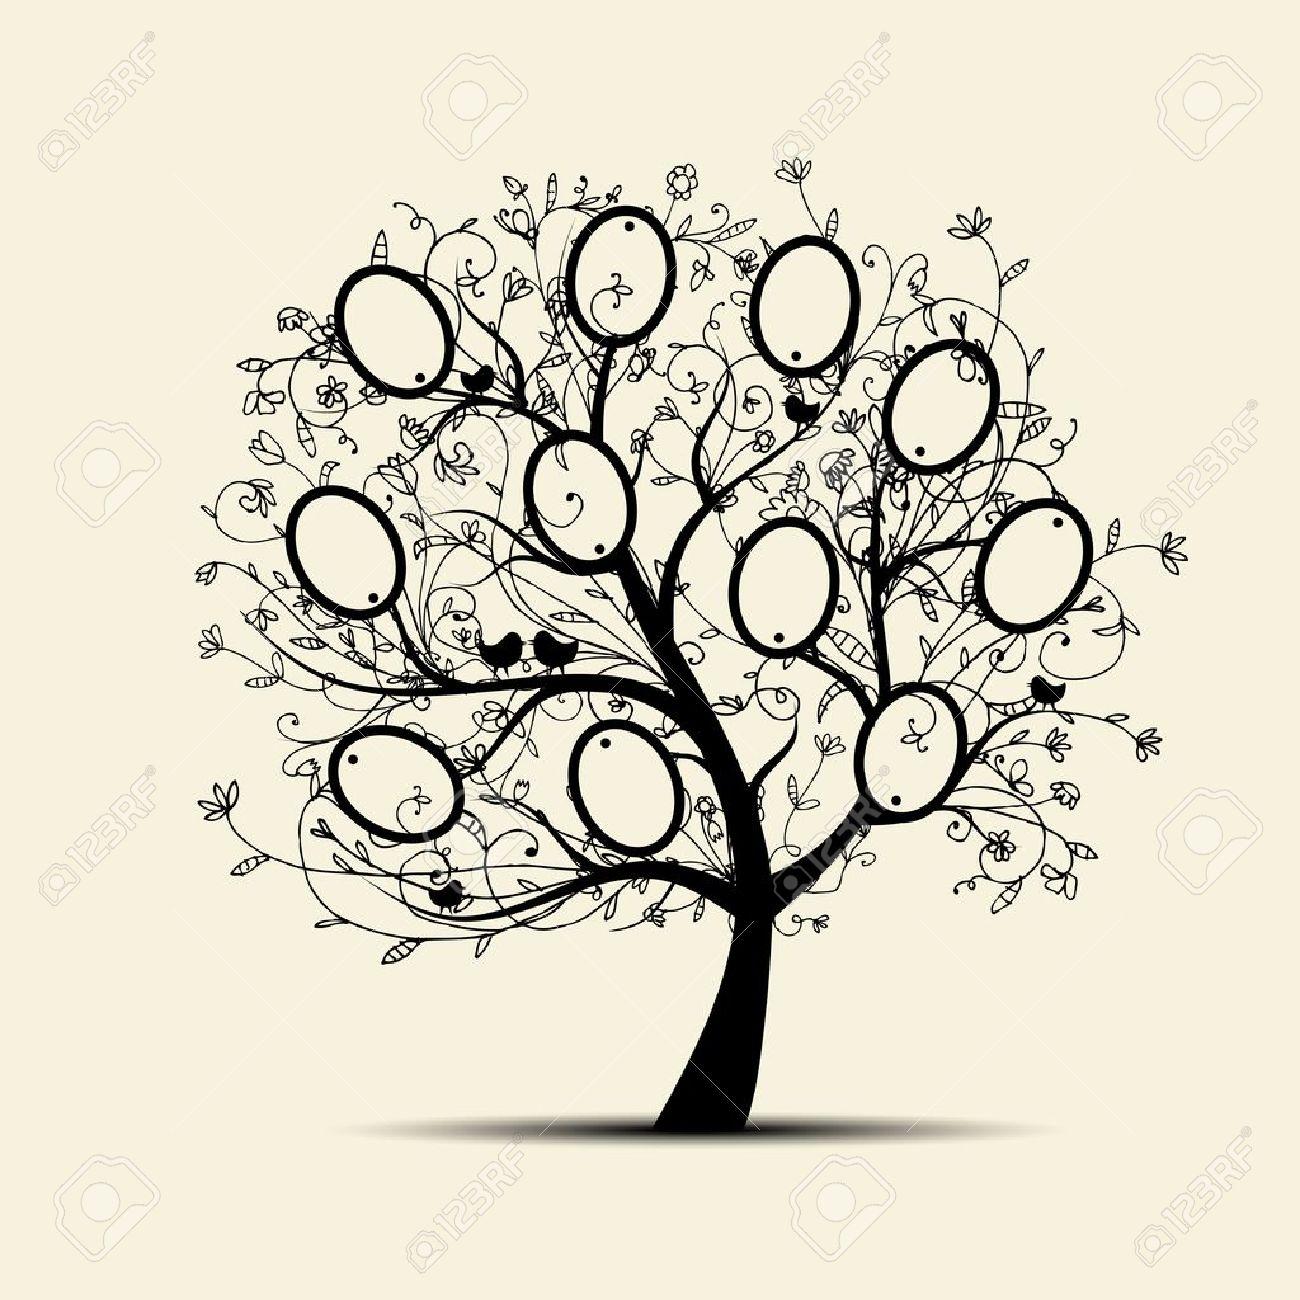 Family Tree Design Tradinghub Co. Supercool Ideas ...